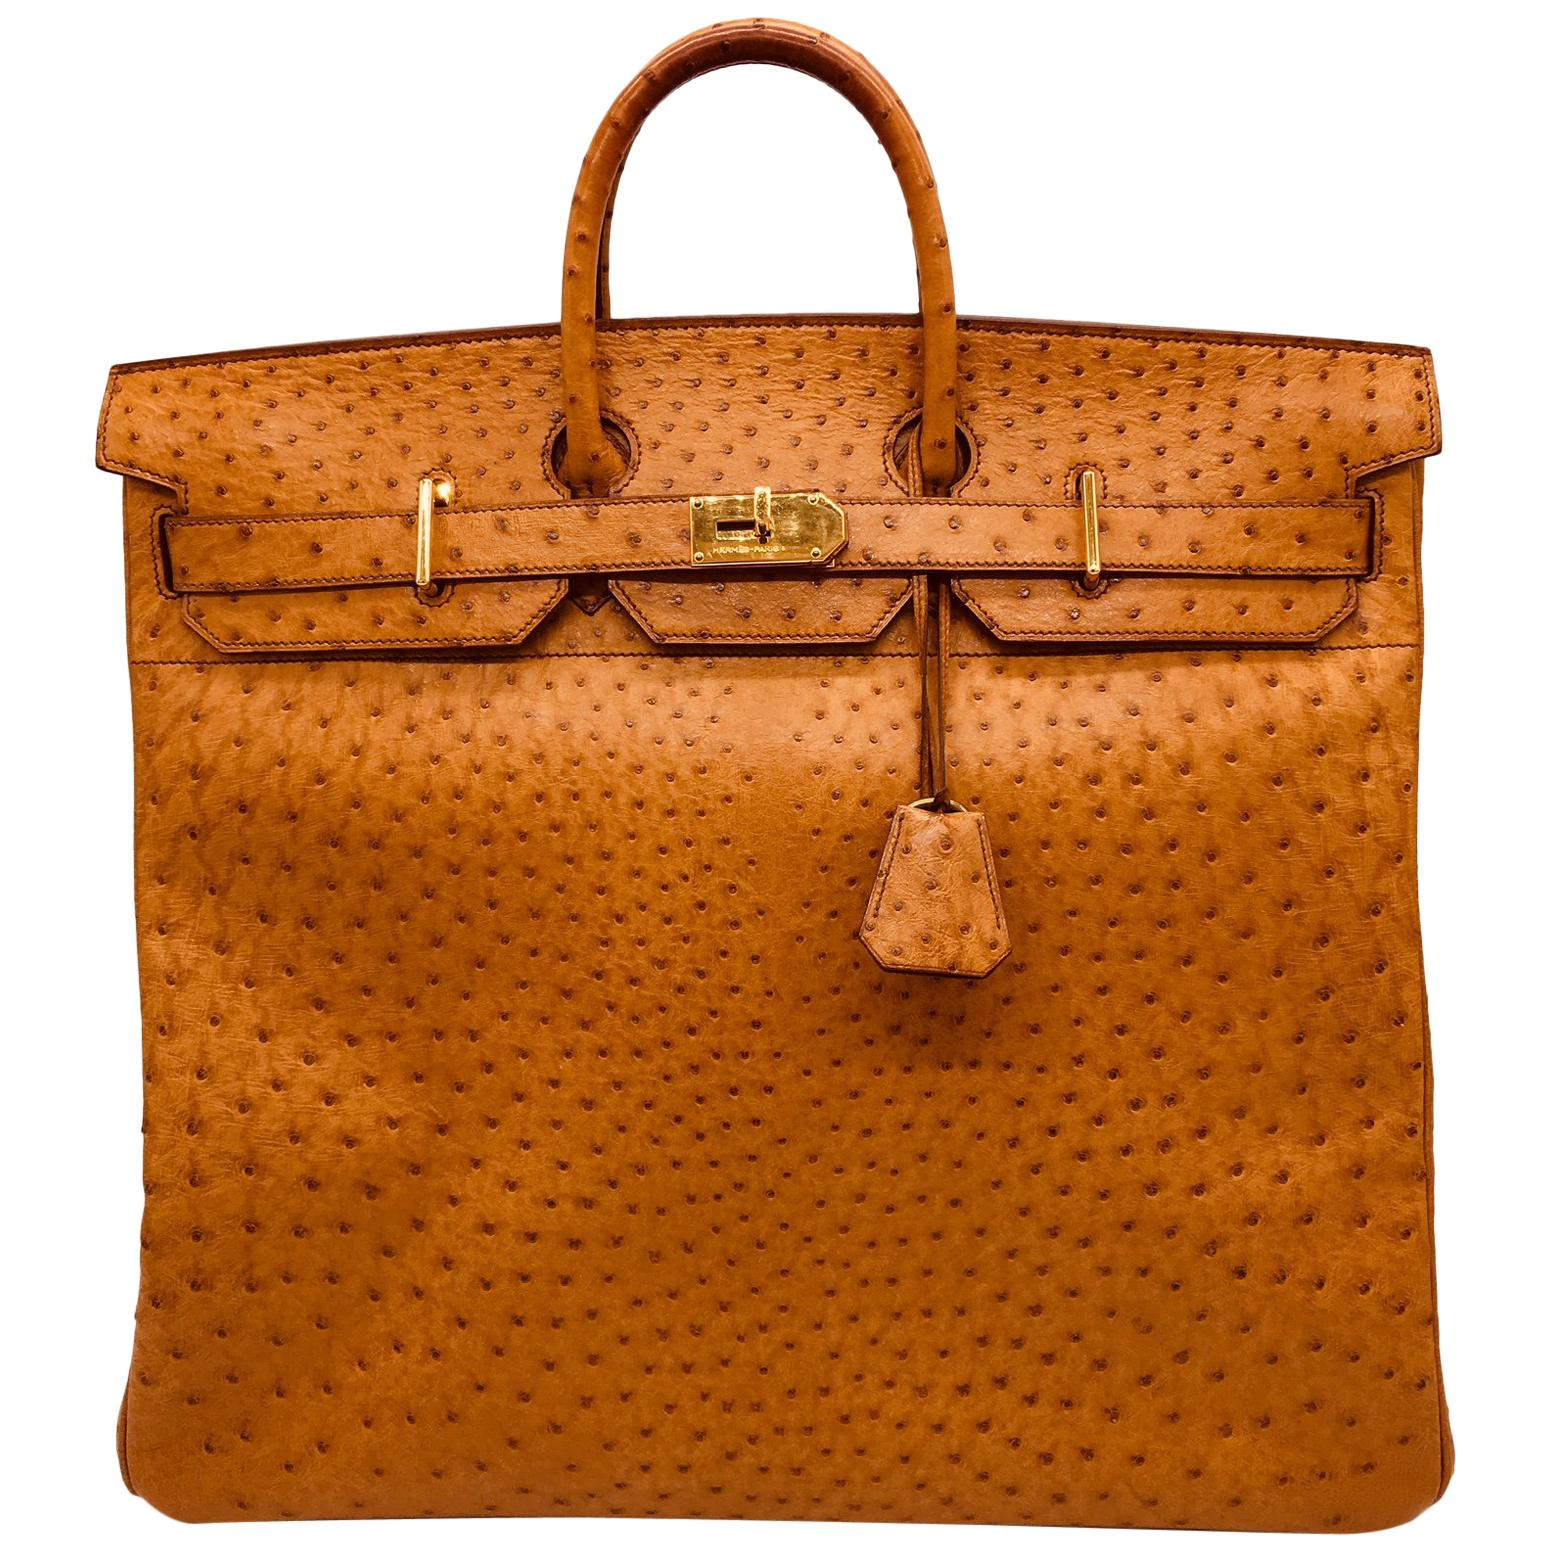 ccf2bb2efb01 Hermes HAC Saffron ostrich Birkin 50cm Bag at 1stdibs